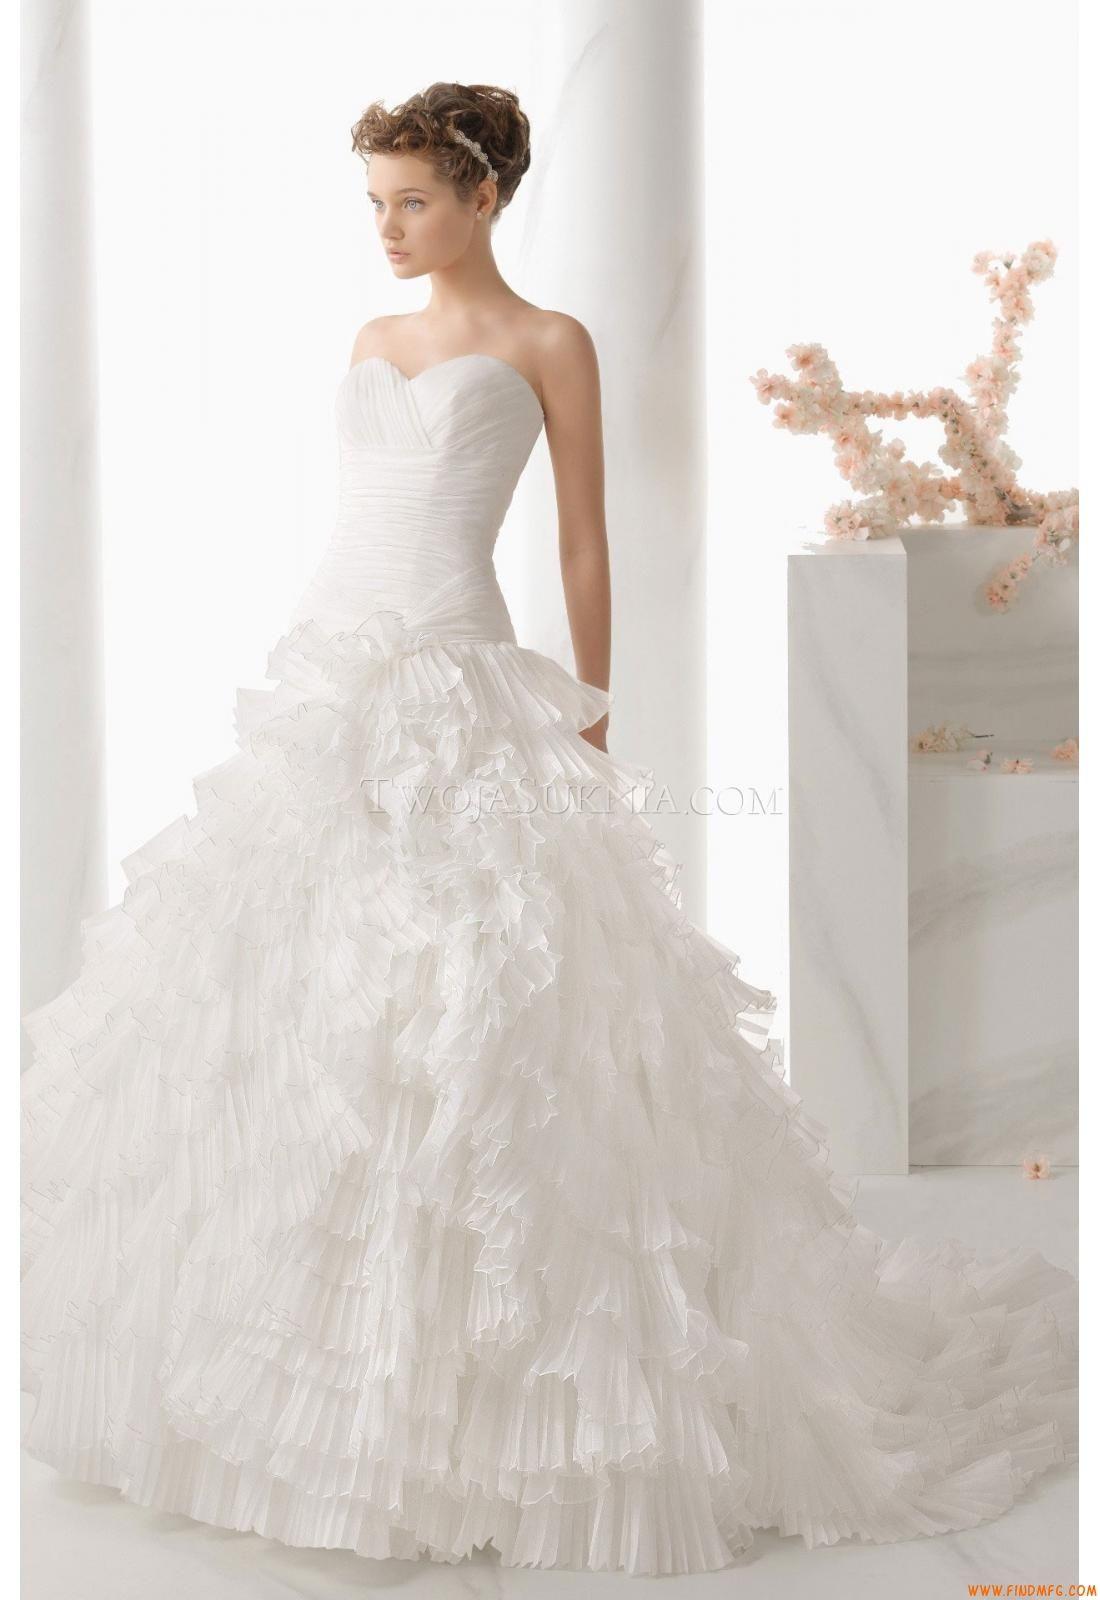 9b8a65cd6 Vestidos de noiva Alma Novia 138 Nervion 2014 Noivado, Wedding Dresses  2014, Vestidos De